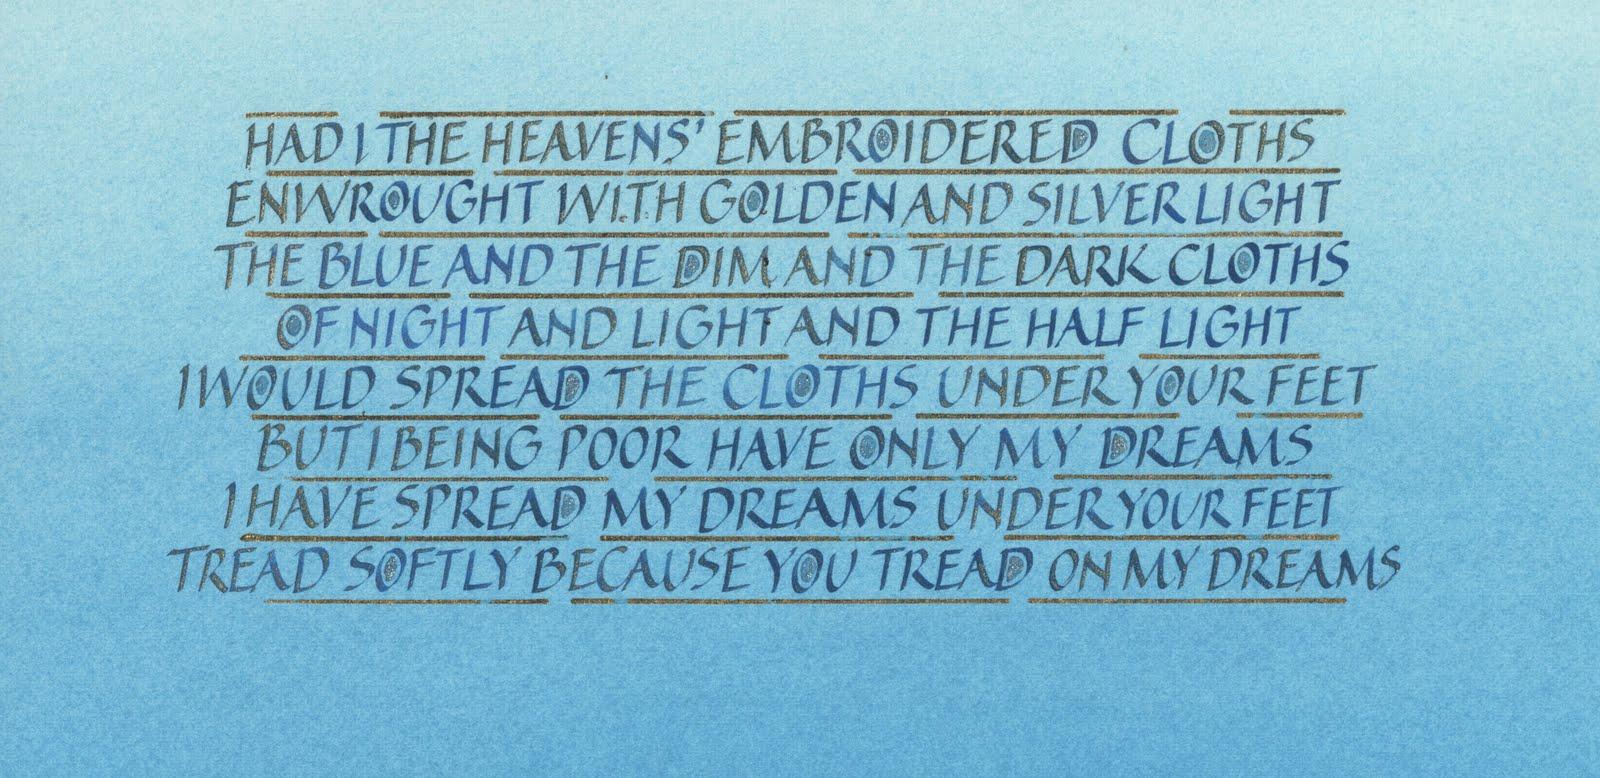 cloths of heaven %photo